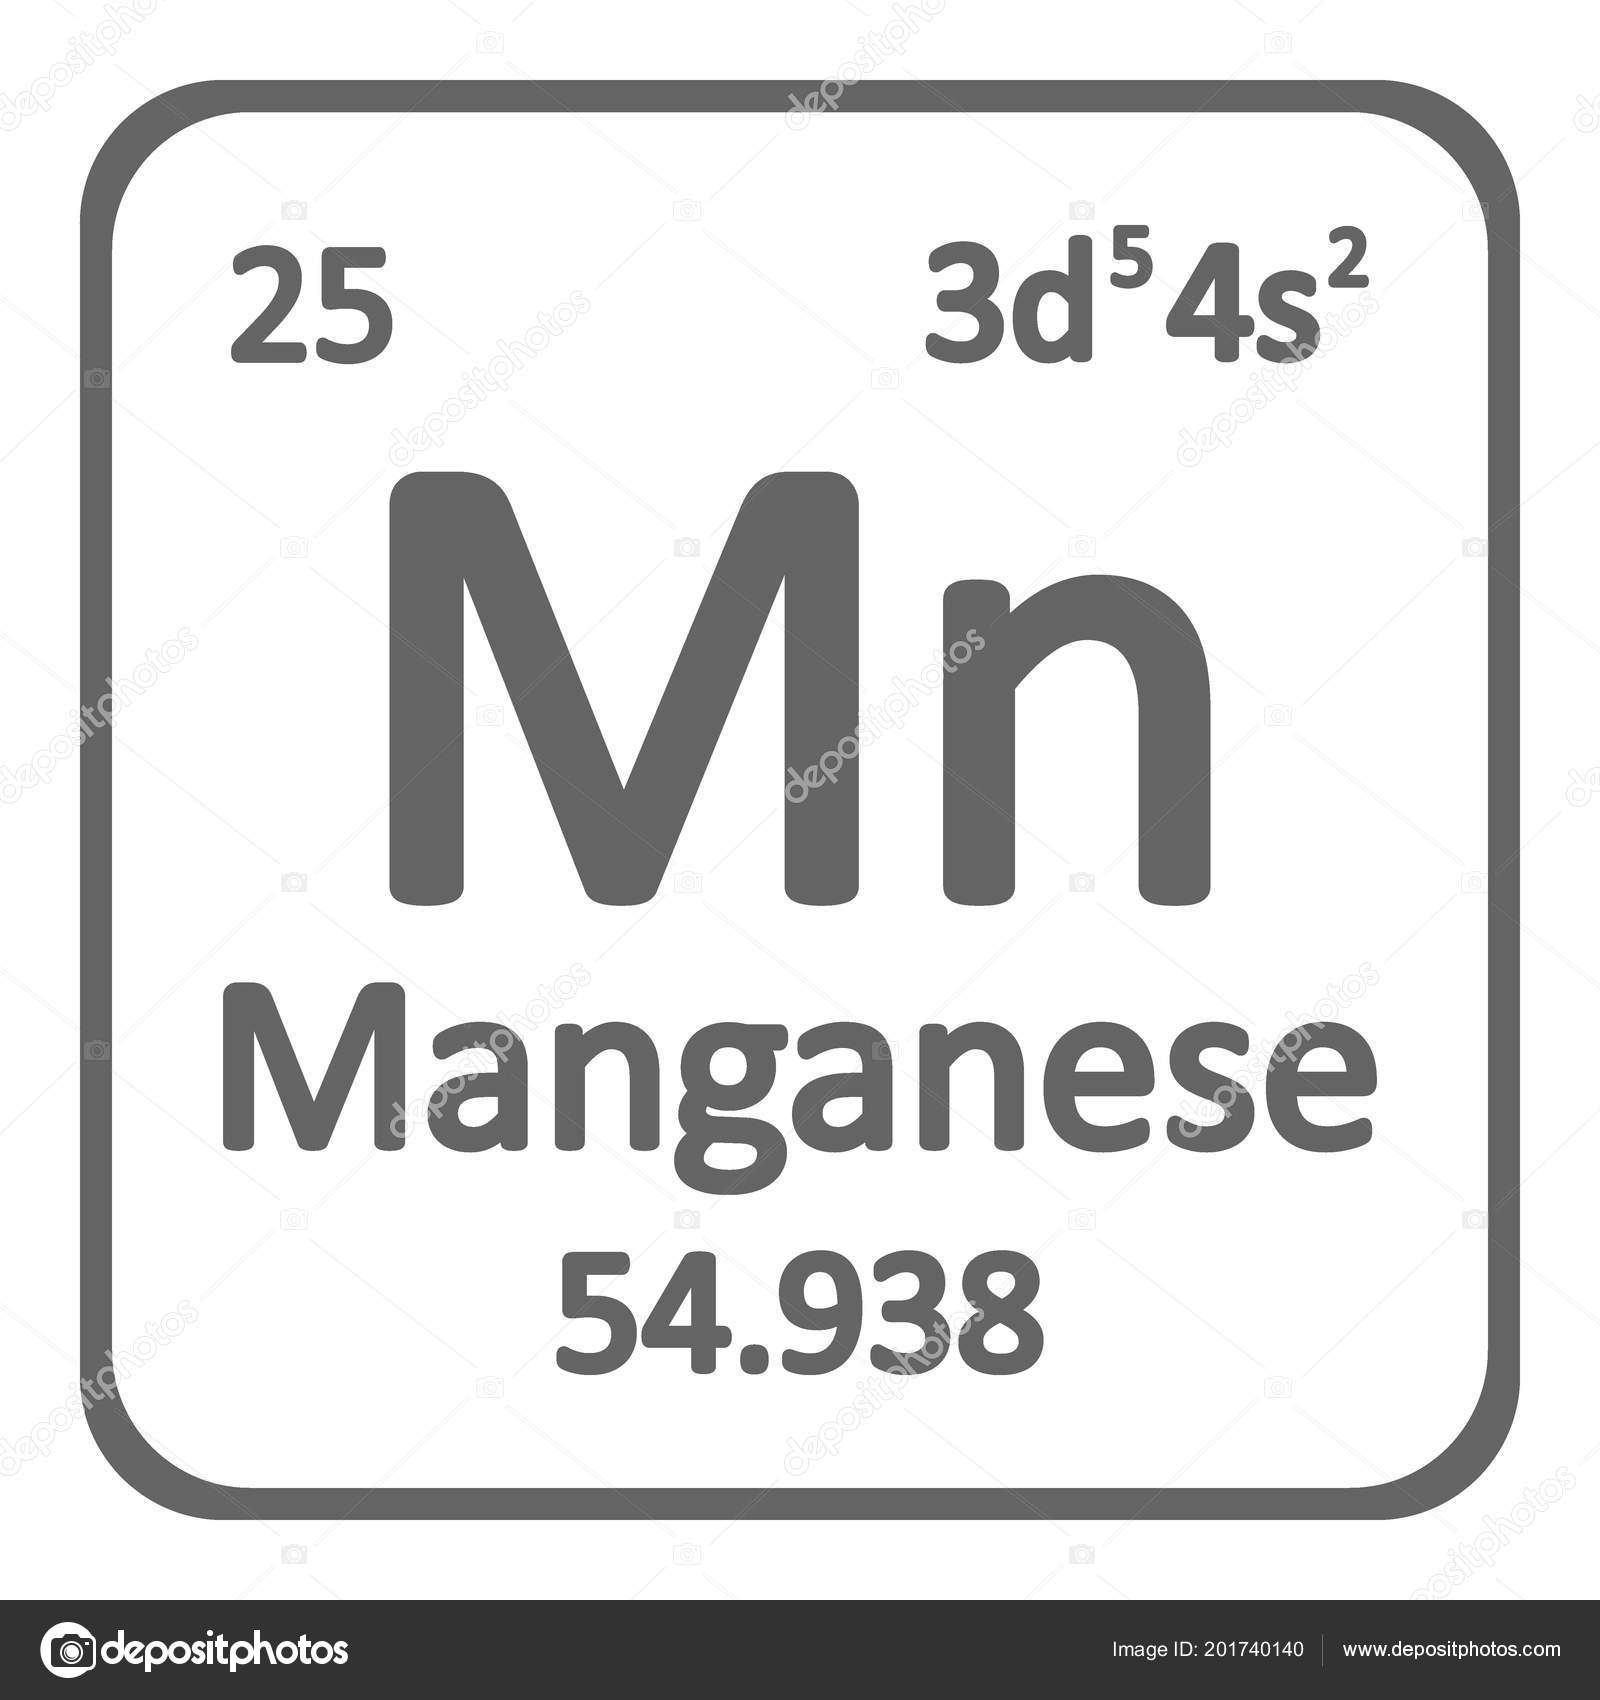 Tabla periodica elemento manganeso icono fondo blanco ilustracin tabla periodica elemento manganeso icono fondo blanco ilustracin vector vector de stock urtaz Image collections